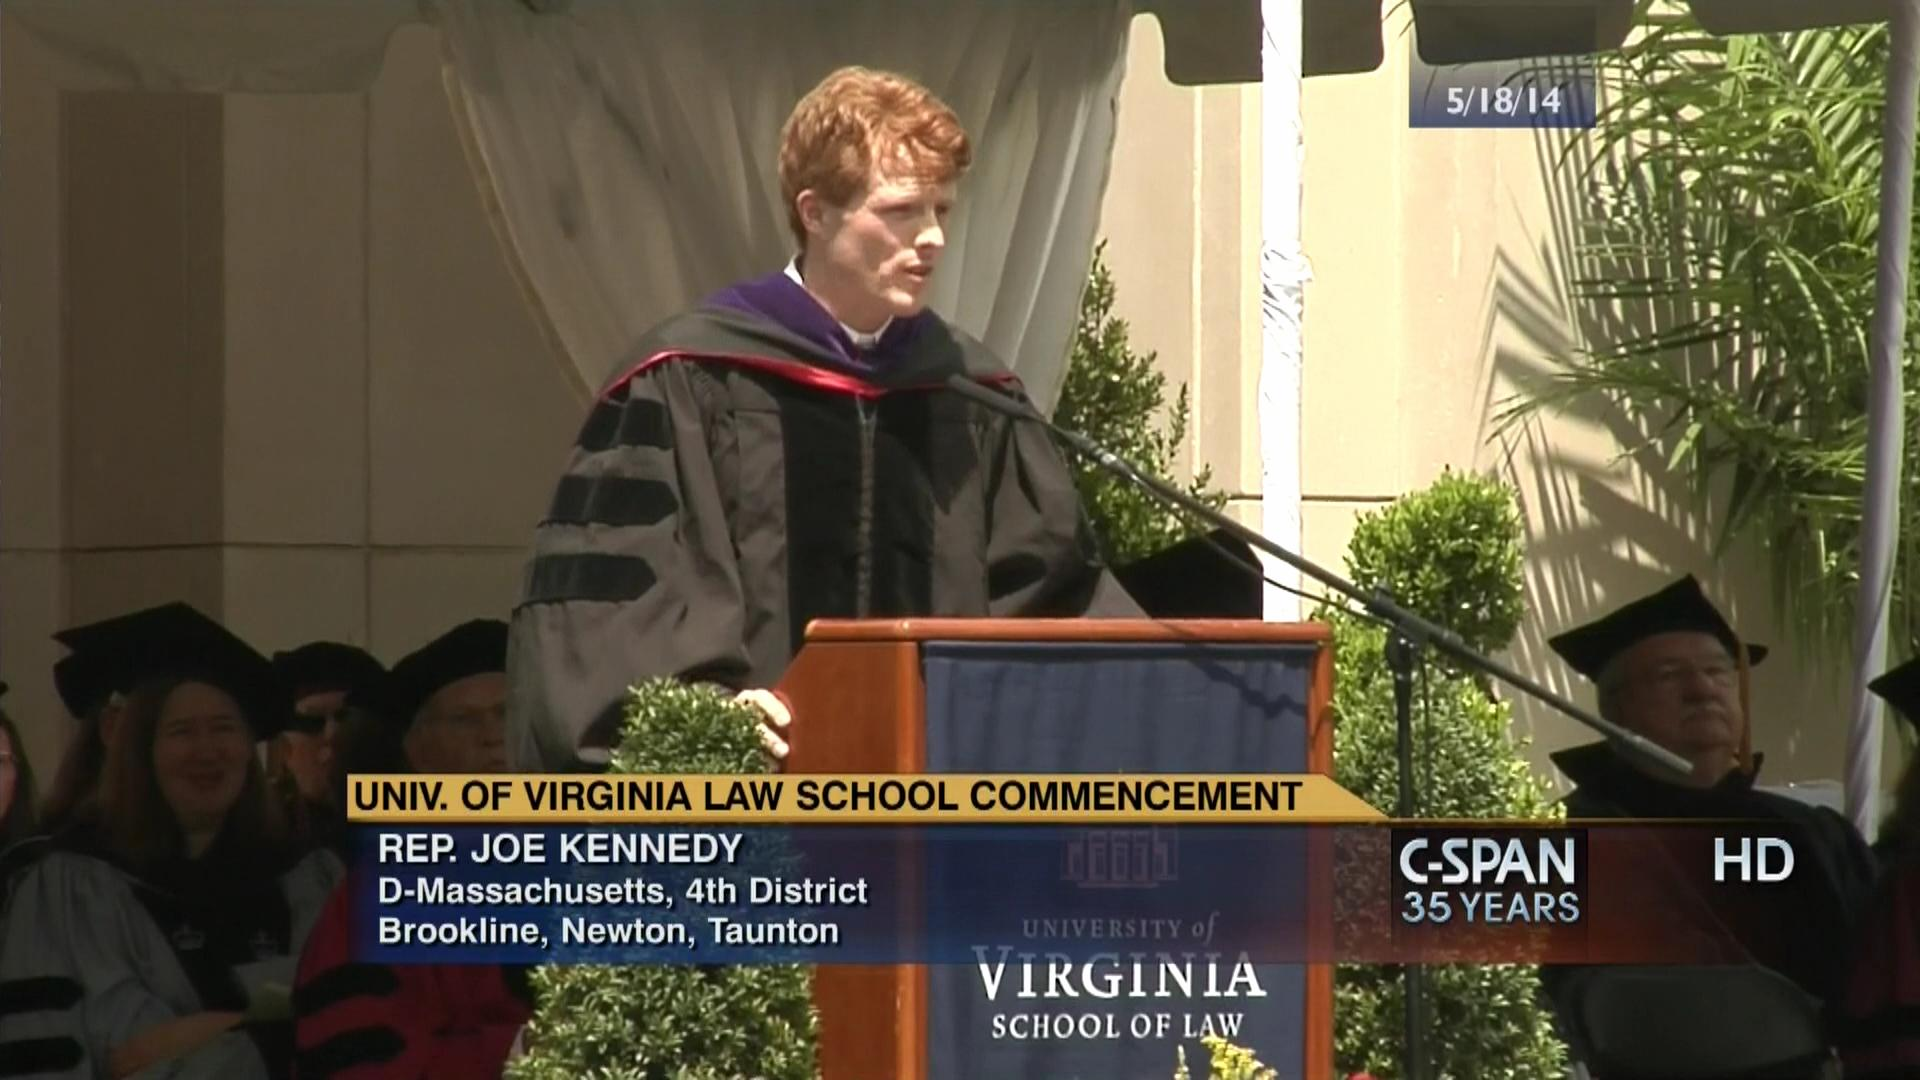 University Of Virginia Law >> University Of Virginia Law School Commencement Address